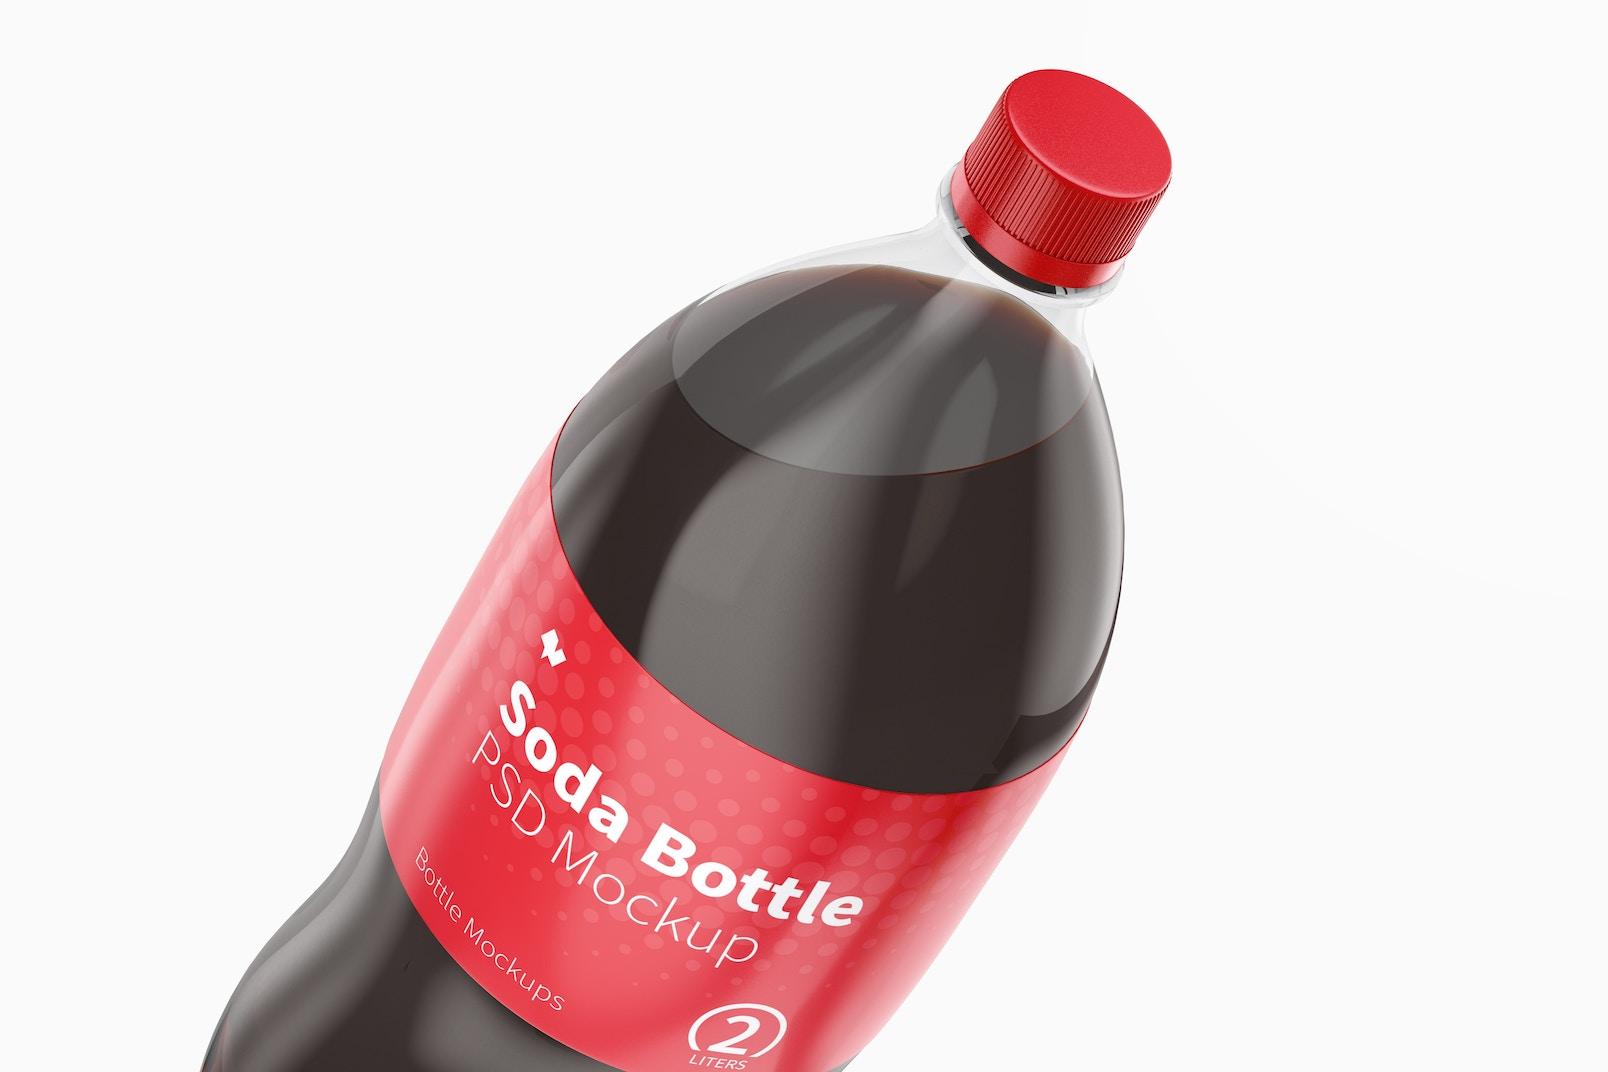 2L Coke Bottles Mockup, Close Up